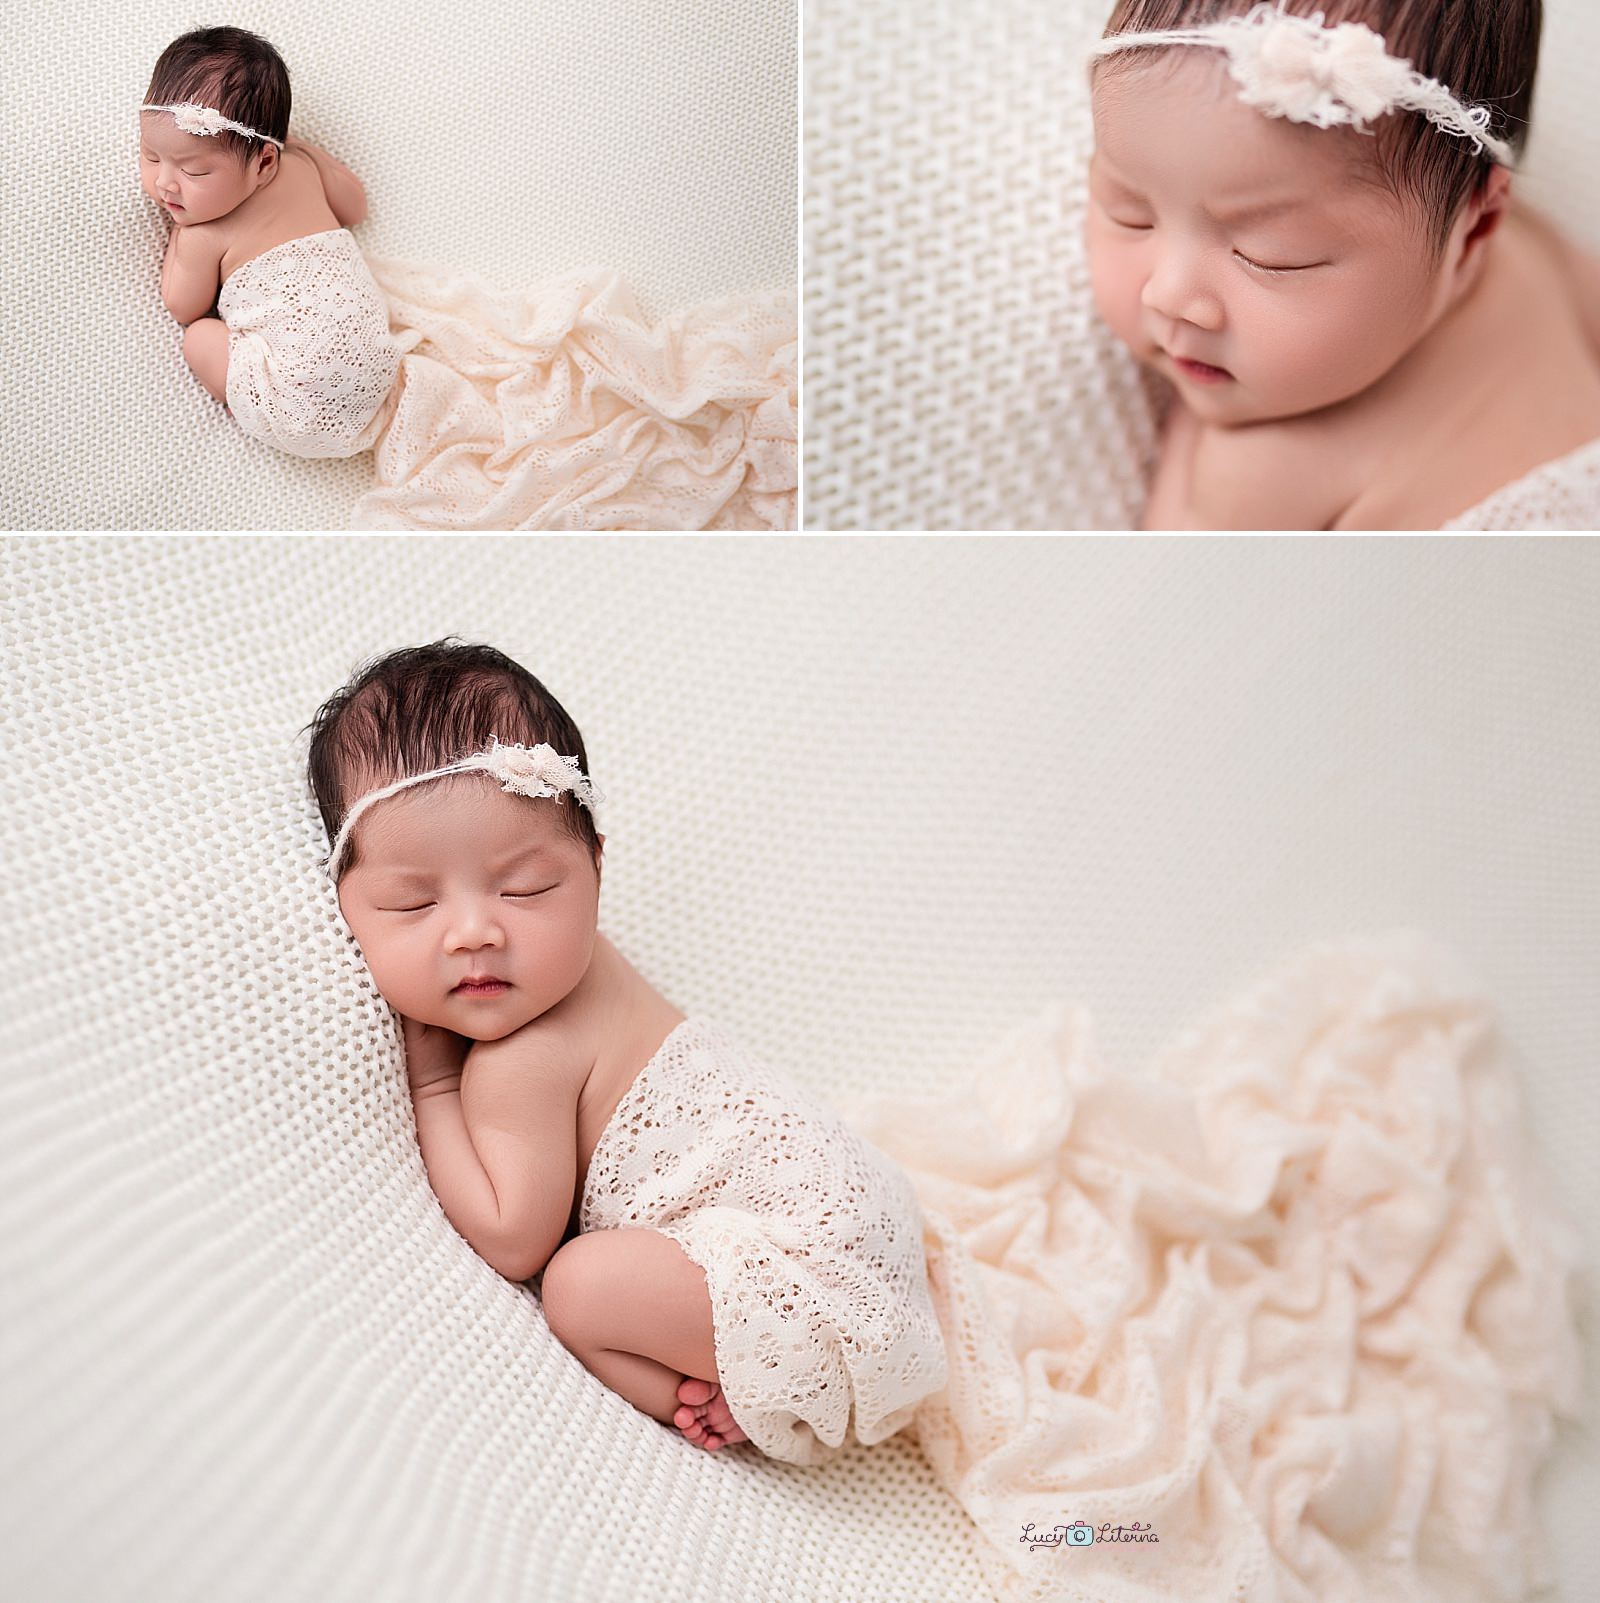 newborn portrait photographer toronto